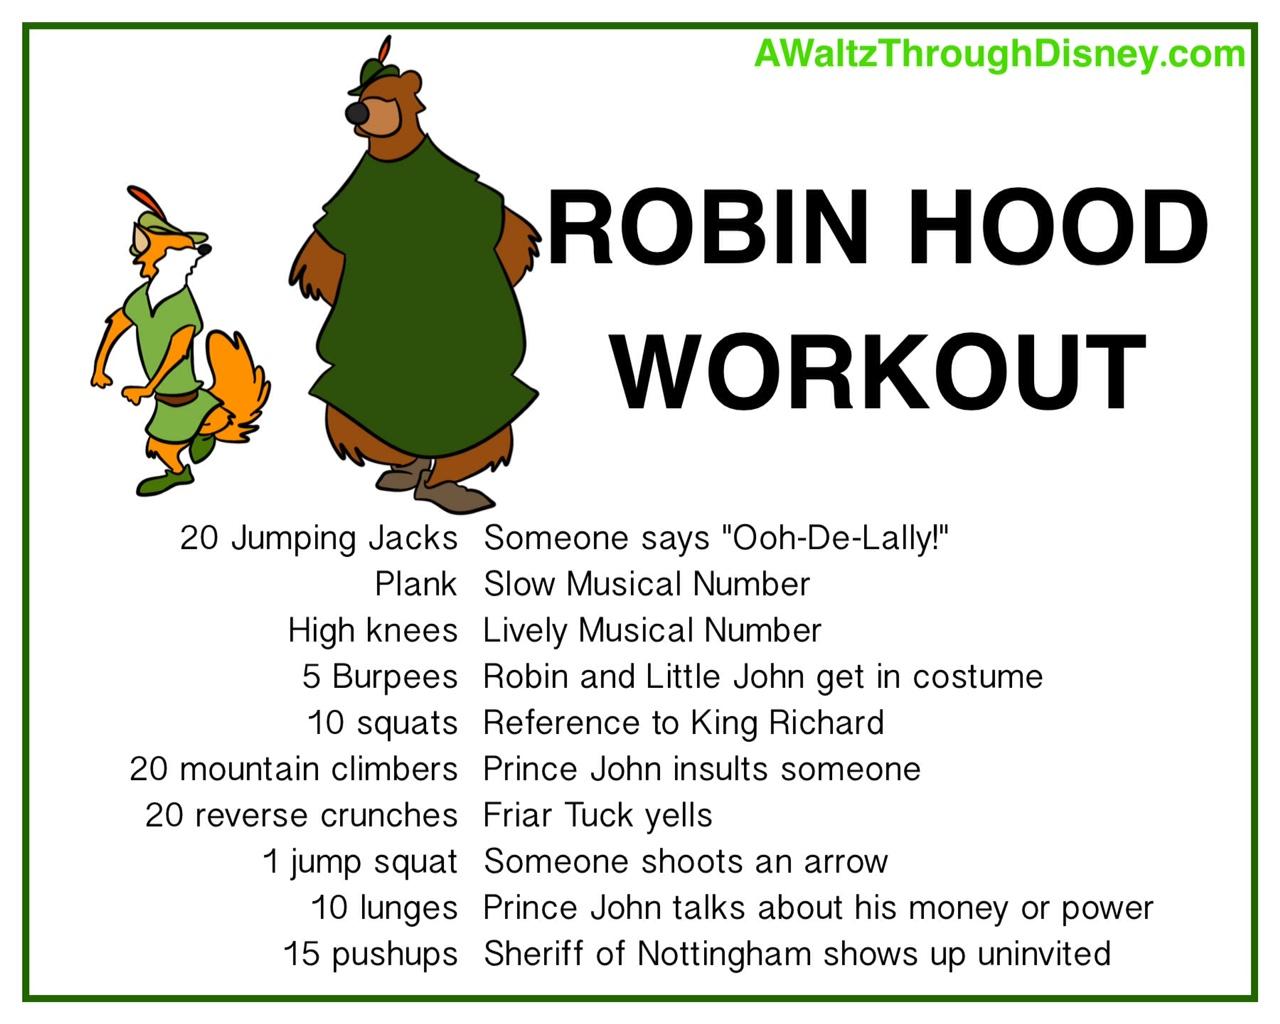 Disney Fit Life Workout 1 Robin Hood